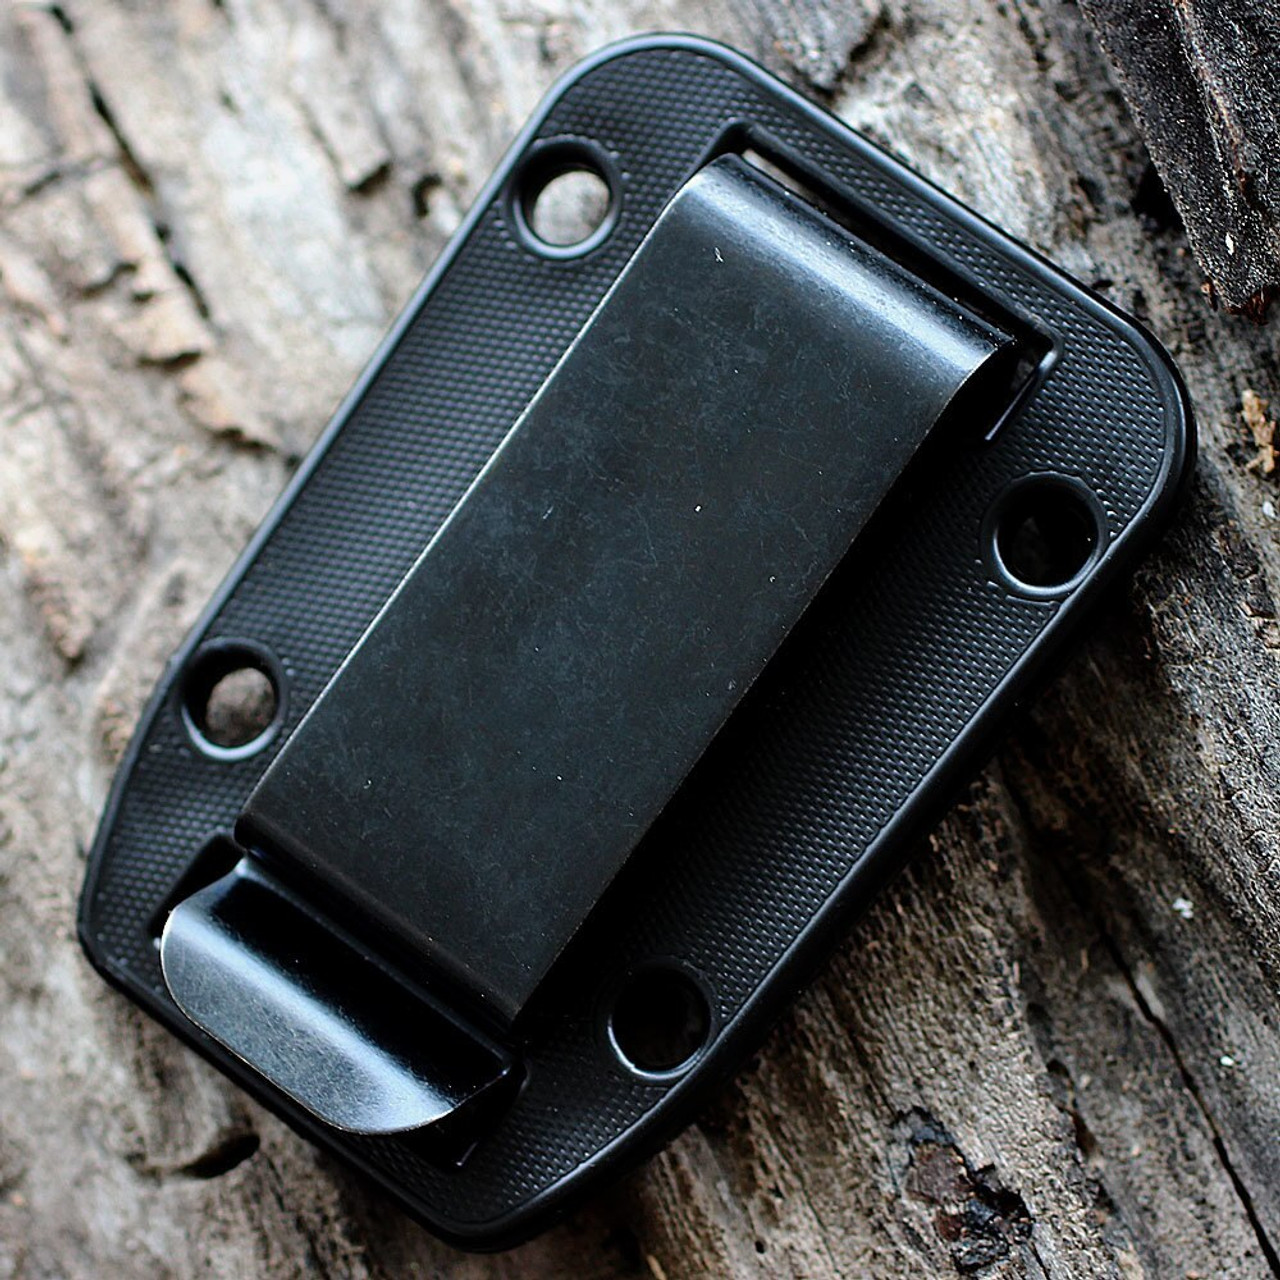 ESEE IZULA Knife Kit, Venom Green, Concealed Carry Knife-No box